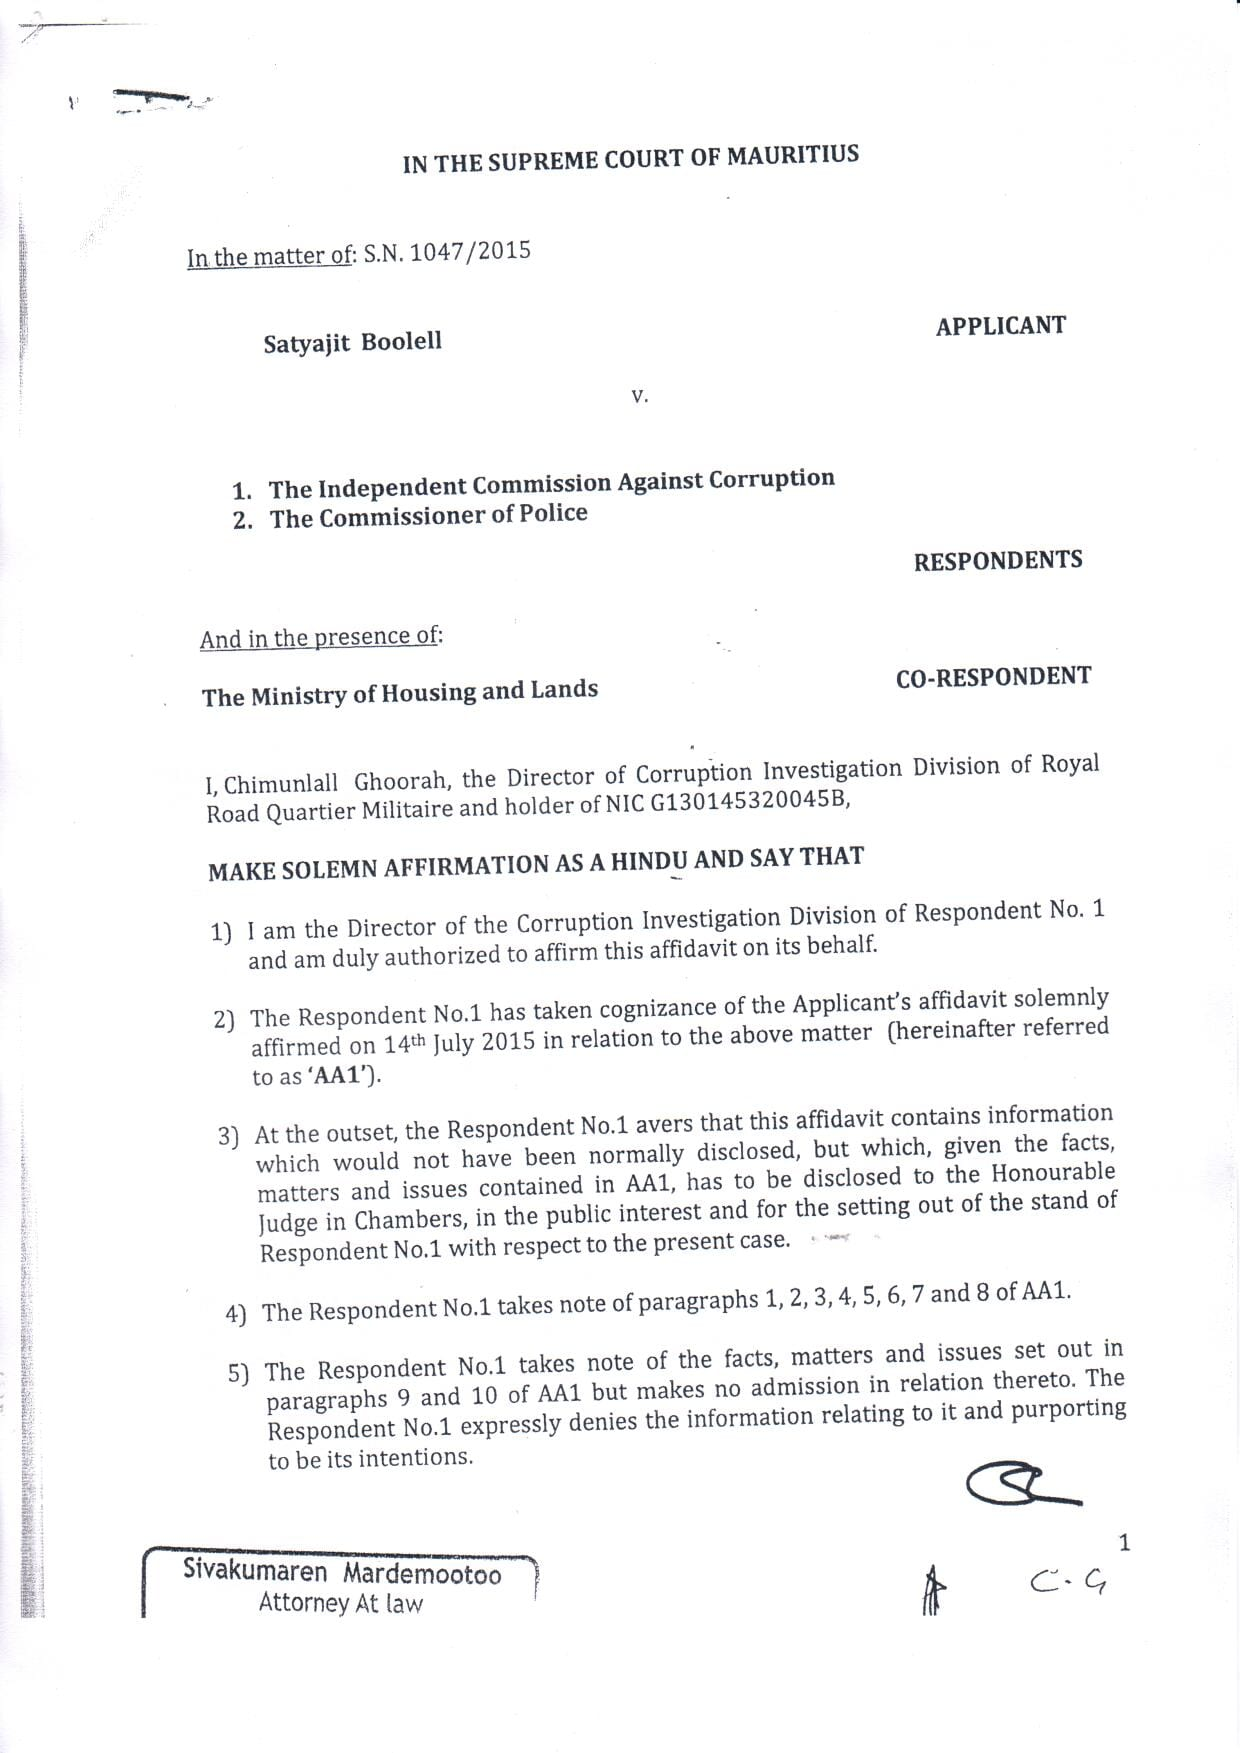 affidavit ICAC boolell 01